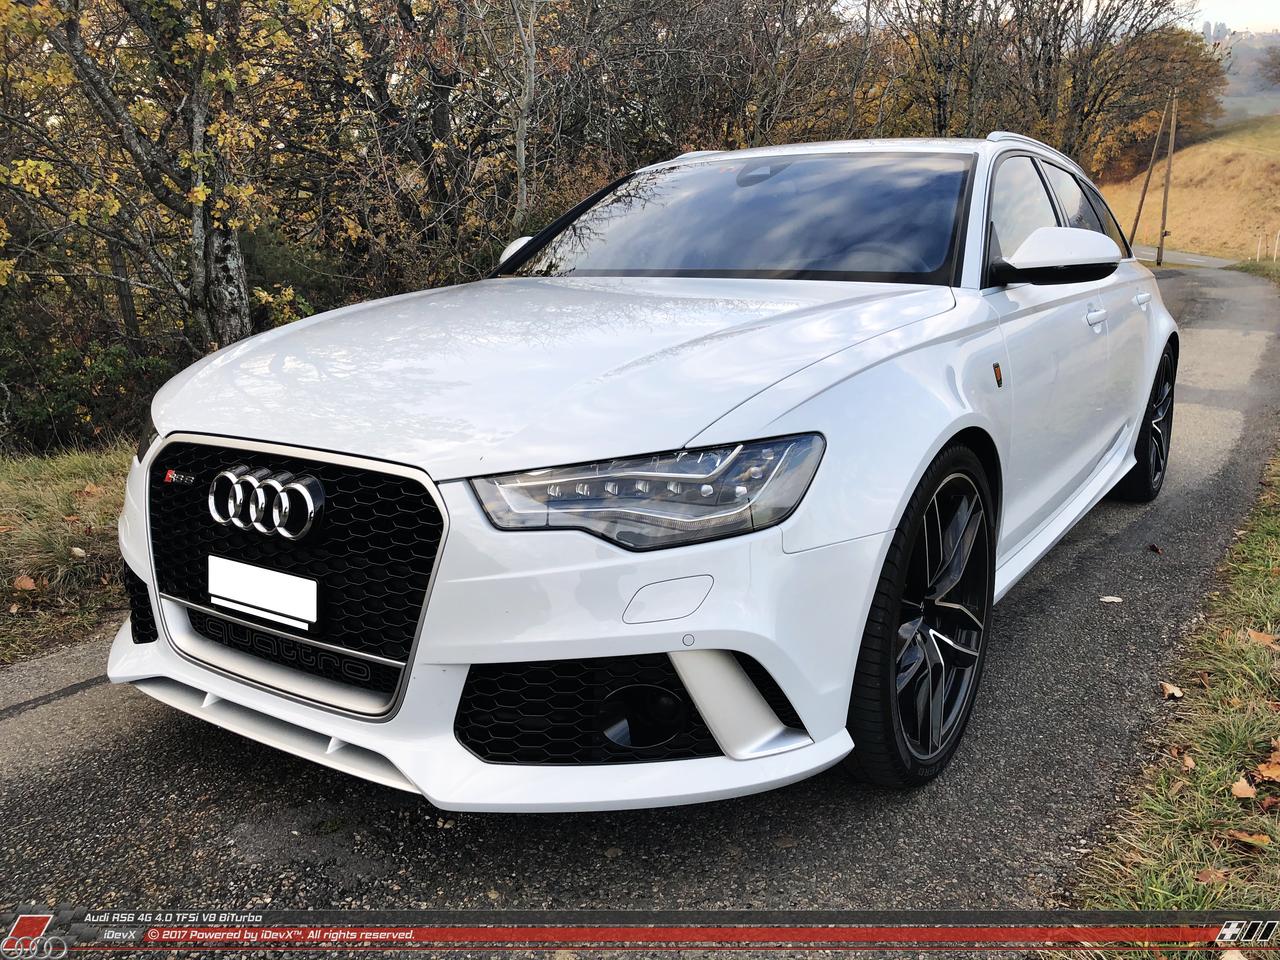 09_11.2018_Audi-RS6_iDevX_002.png